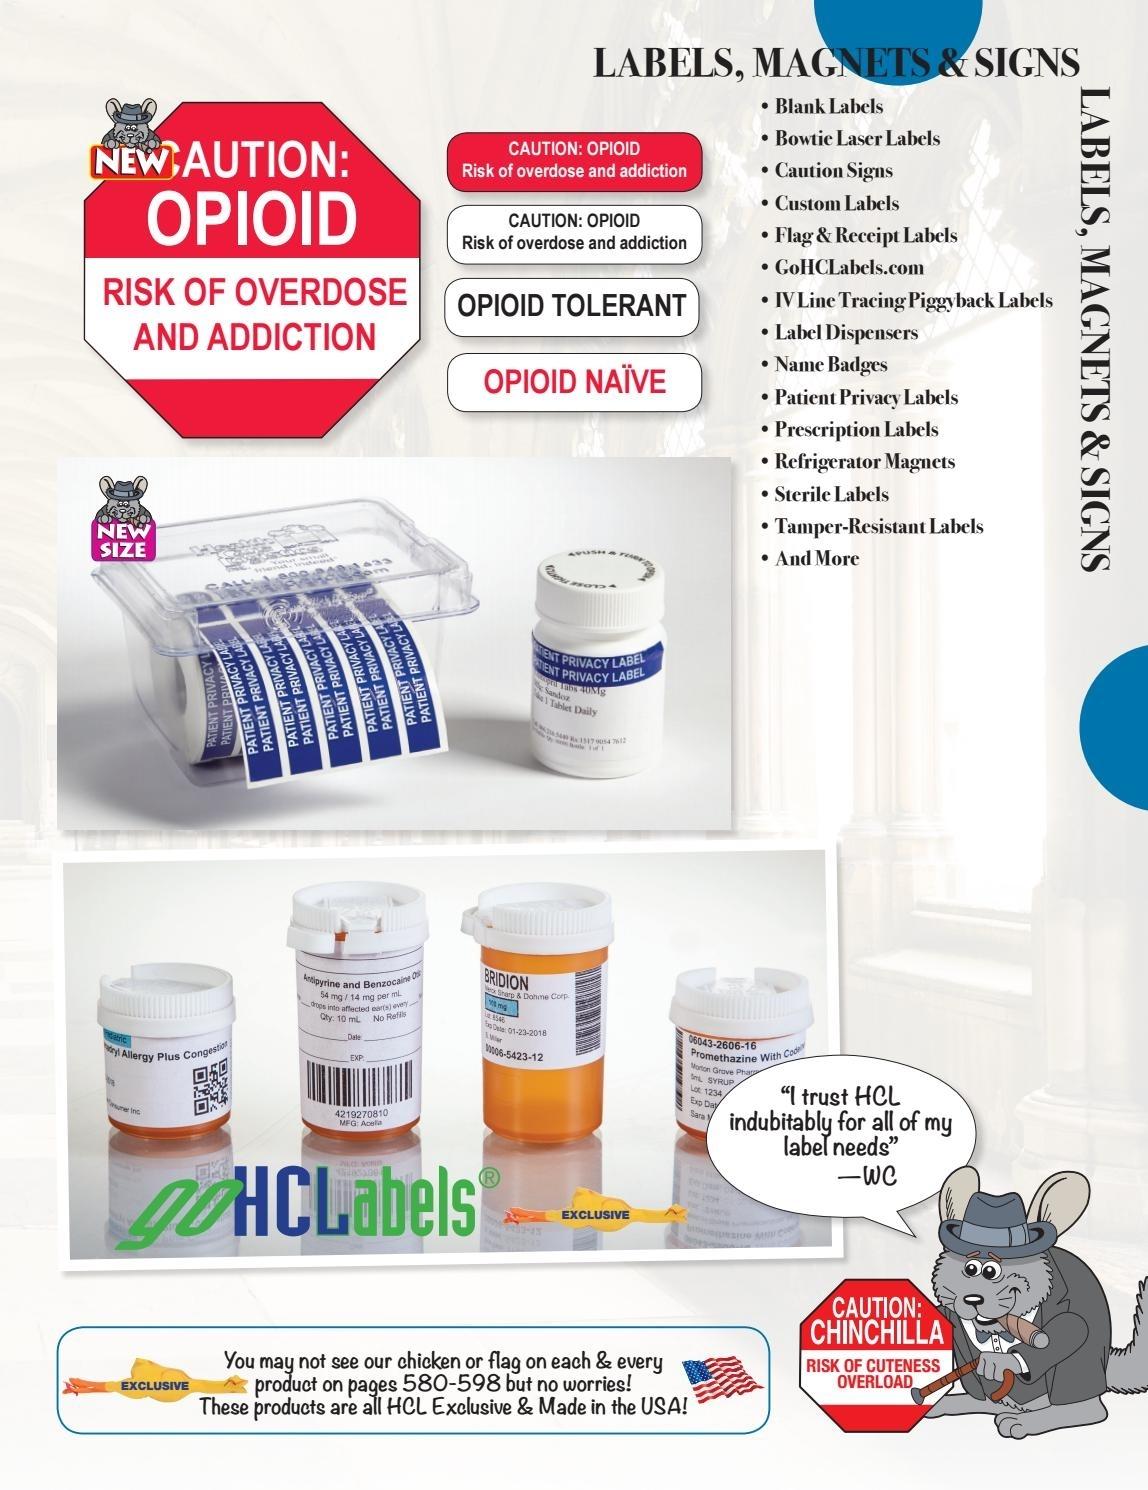 Hcl Winston Churchilla Labels By Health Care Logistics - Issuu